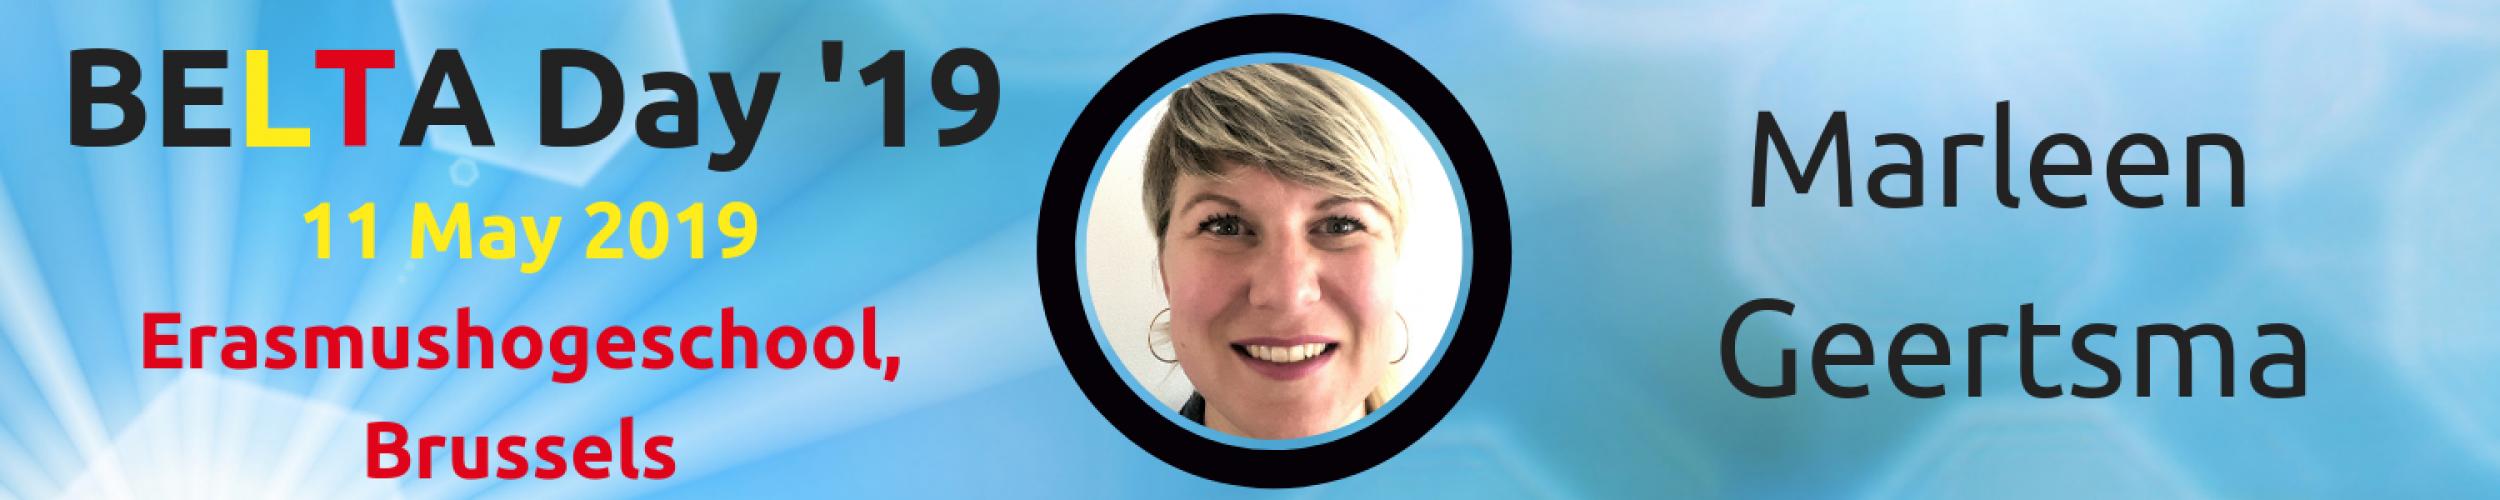 BELTA Day '19: Meet the Speakers: Marleen Geertsma